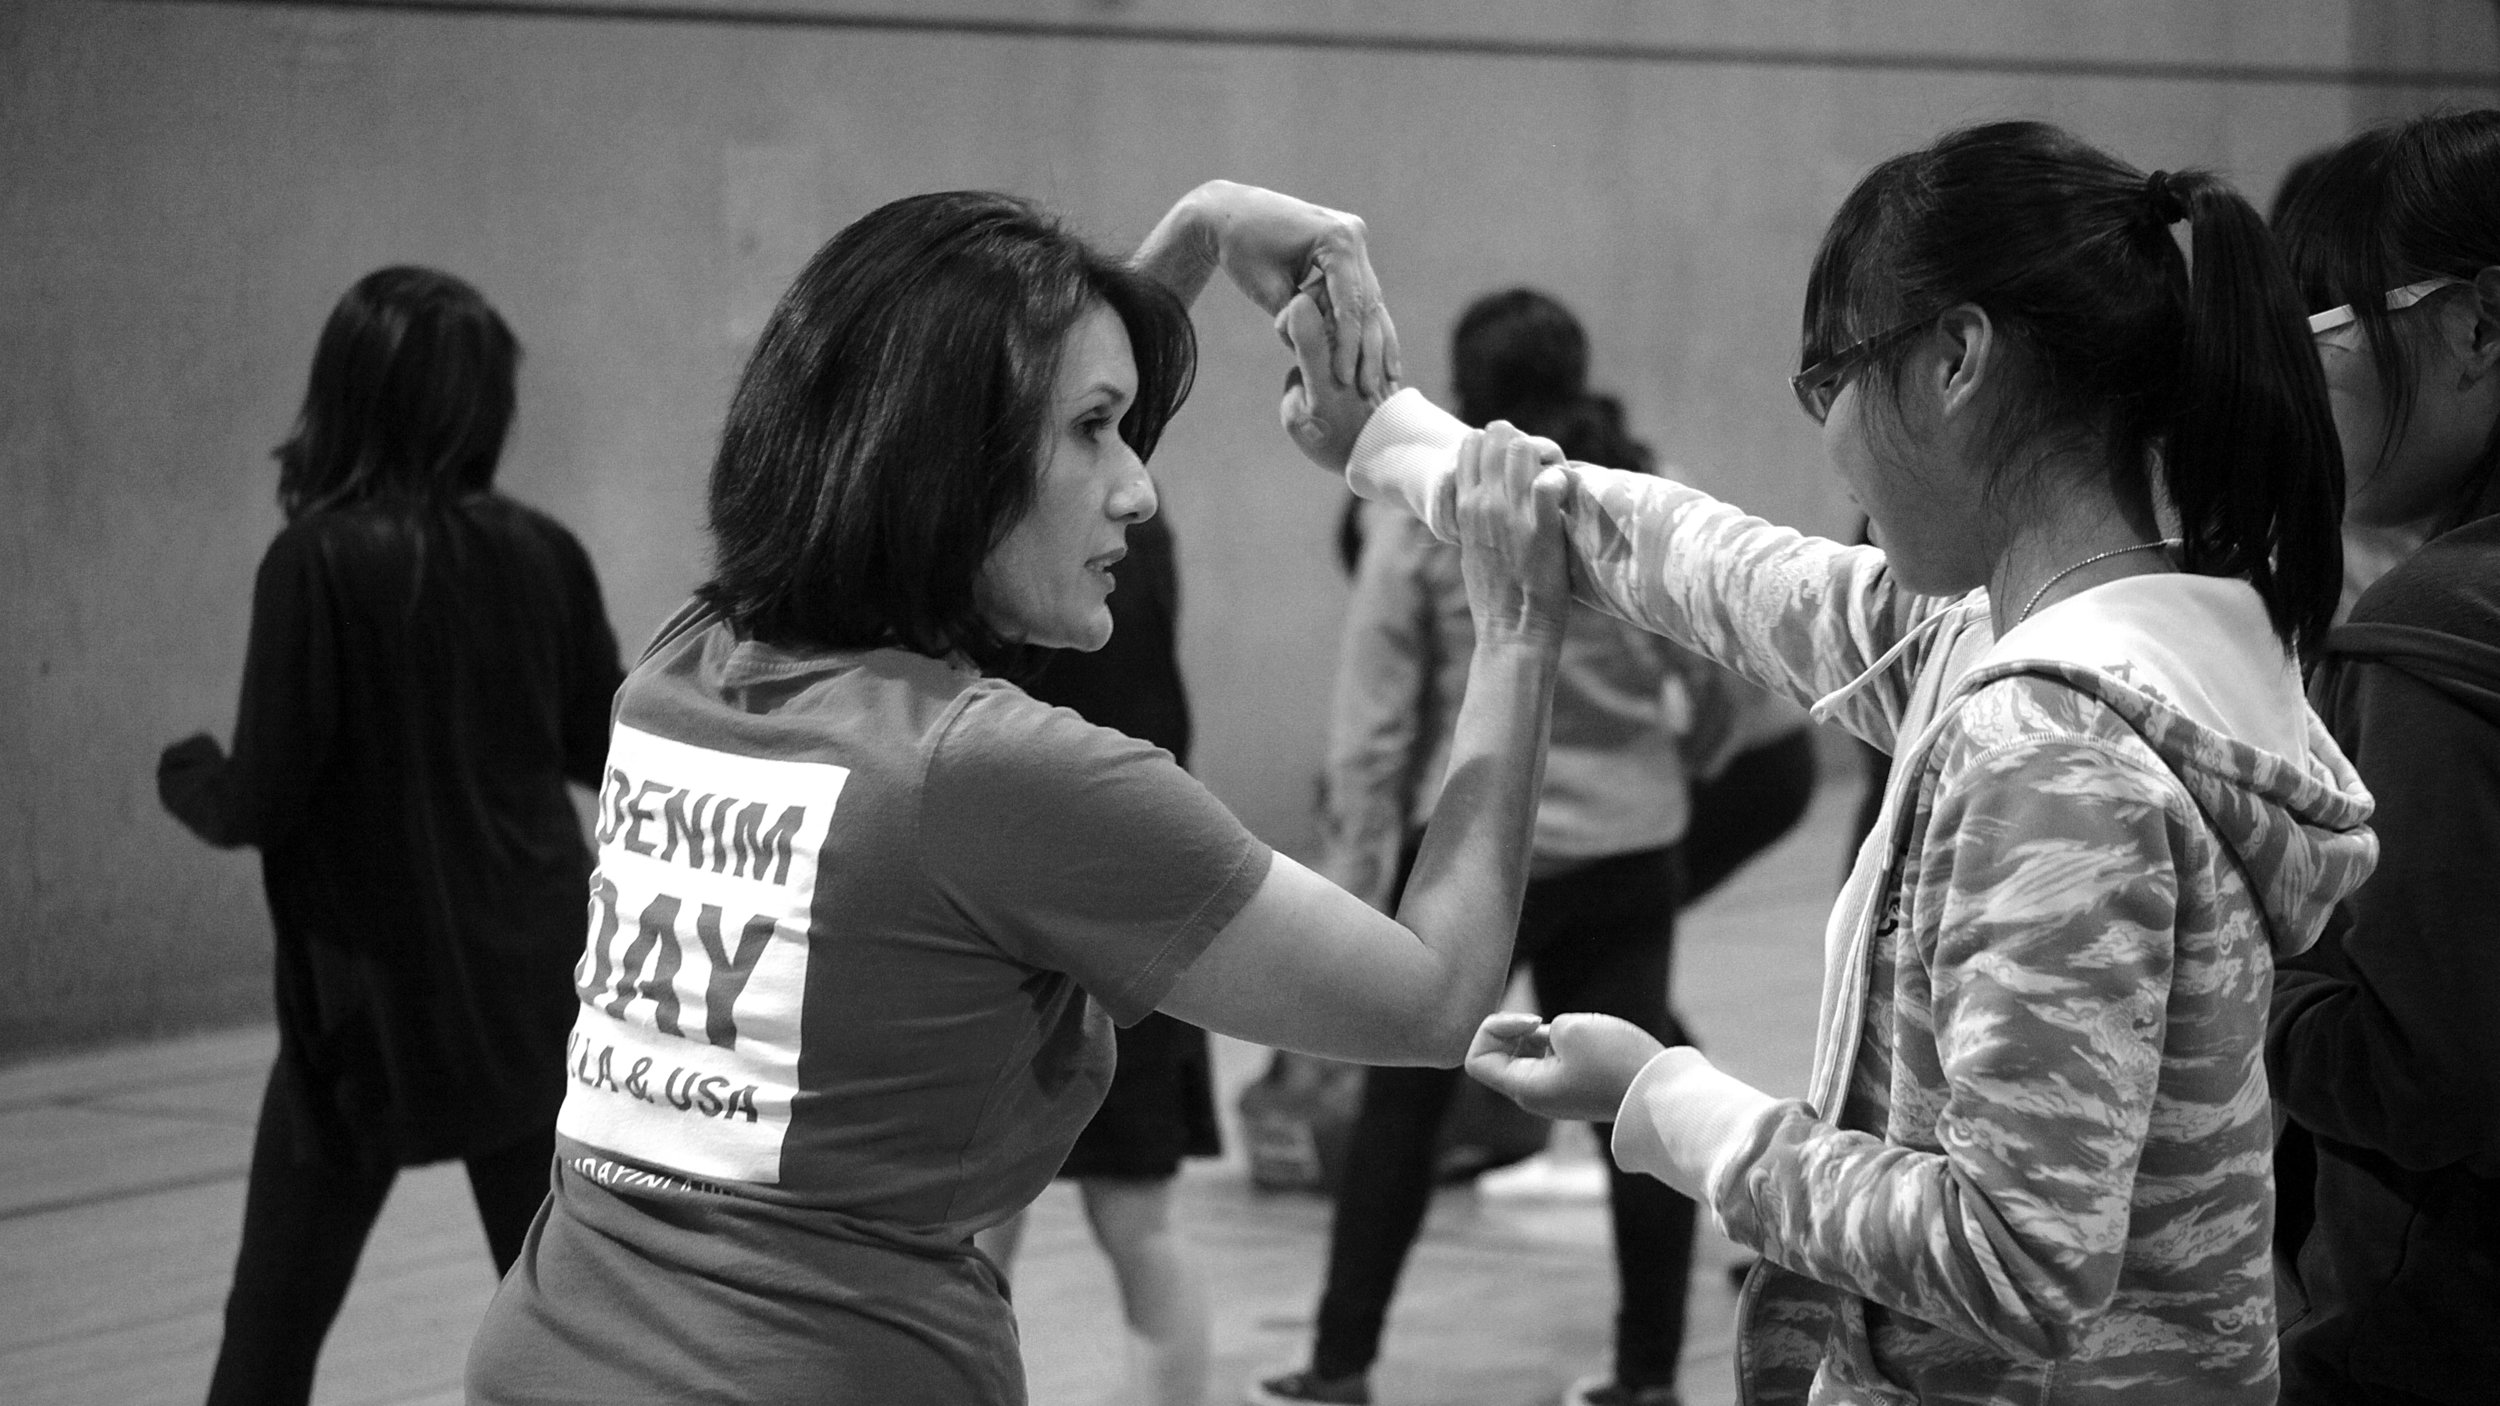 Empowerment Self Defense Peace Over Violence